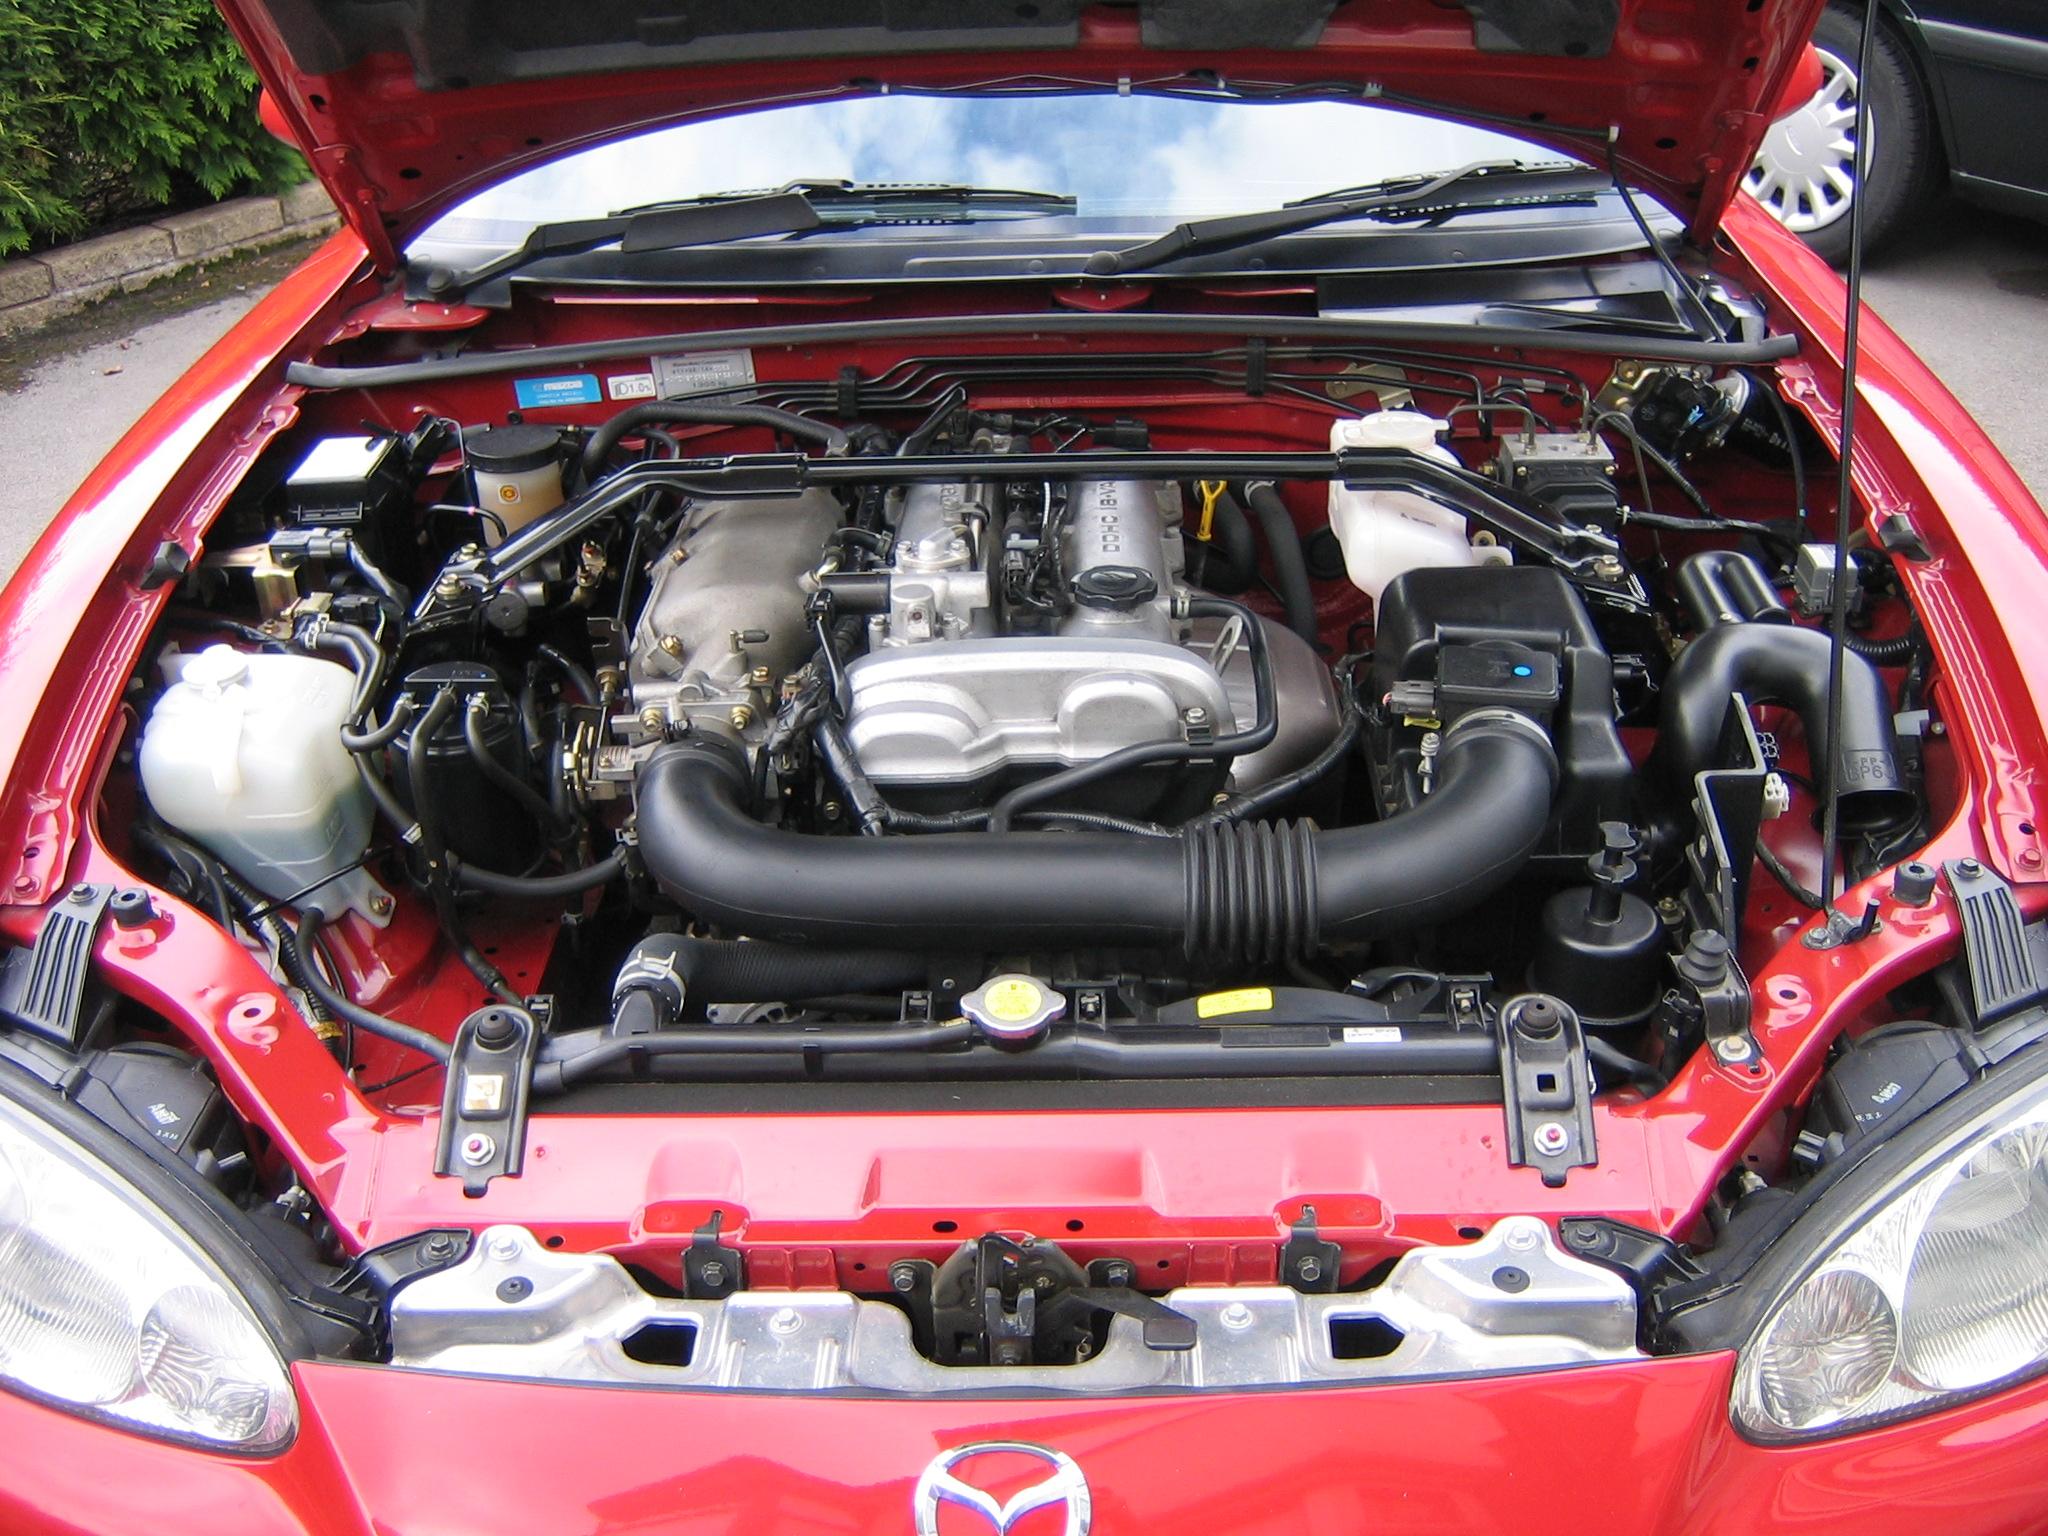 File:2002 Mazda MX5 NB Mk2 Sport1,840cc 4-cylinder DOHC ...